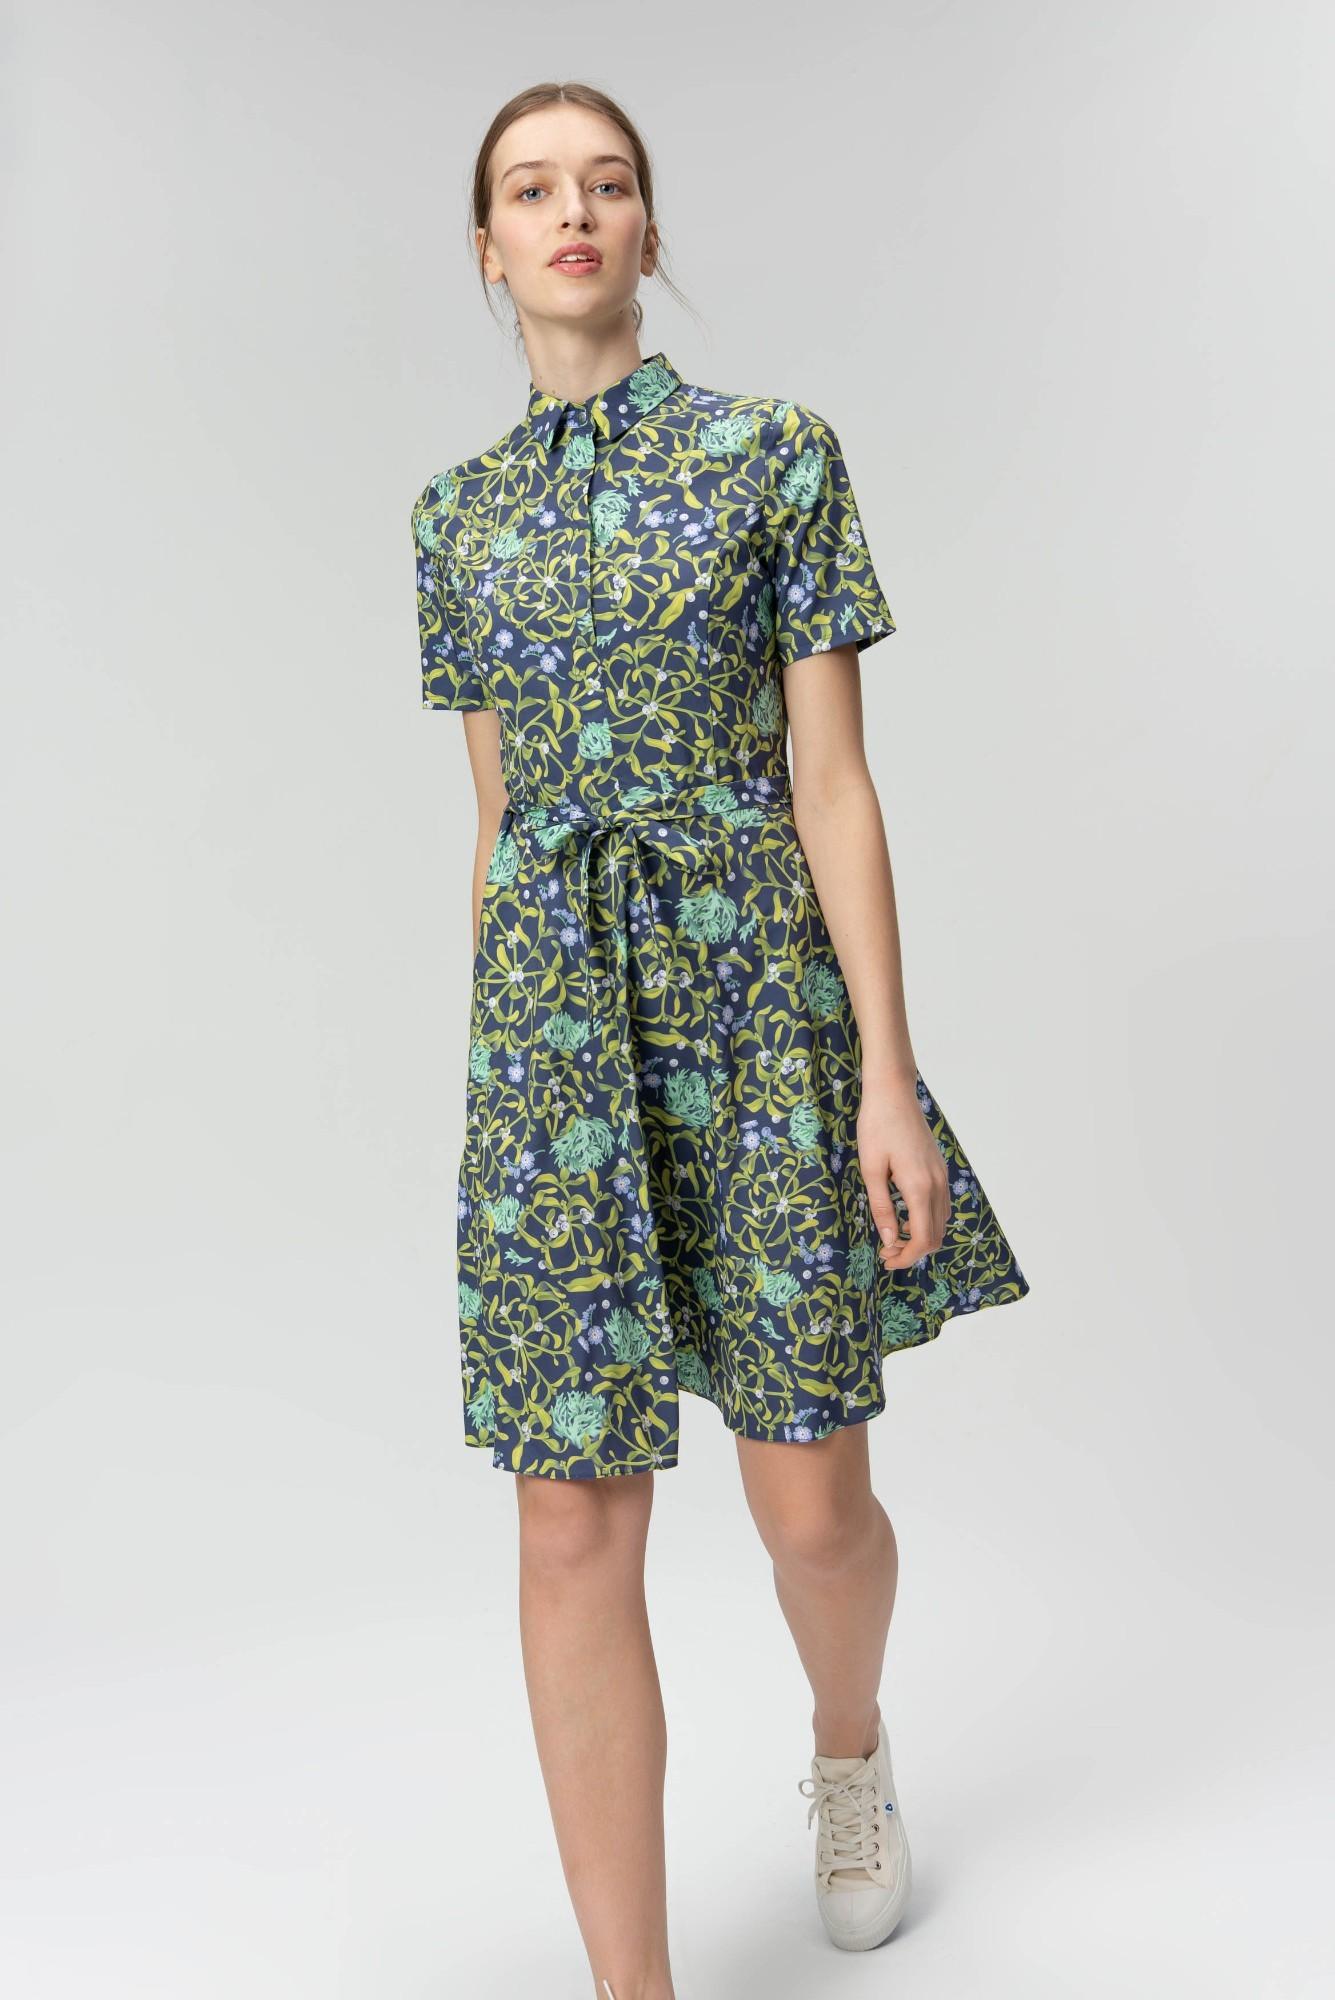 AUDIMAS Neglamži lengva marginta suknelė 20FL-239 Dark Garden L